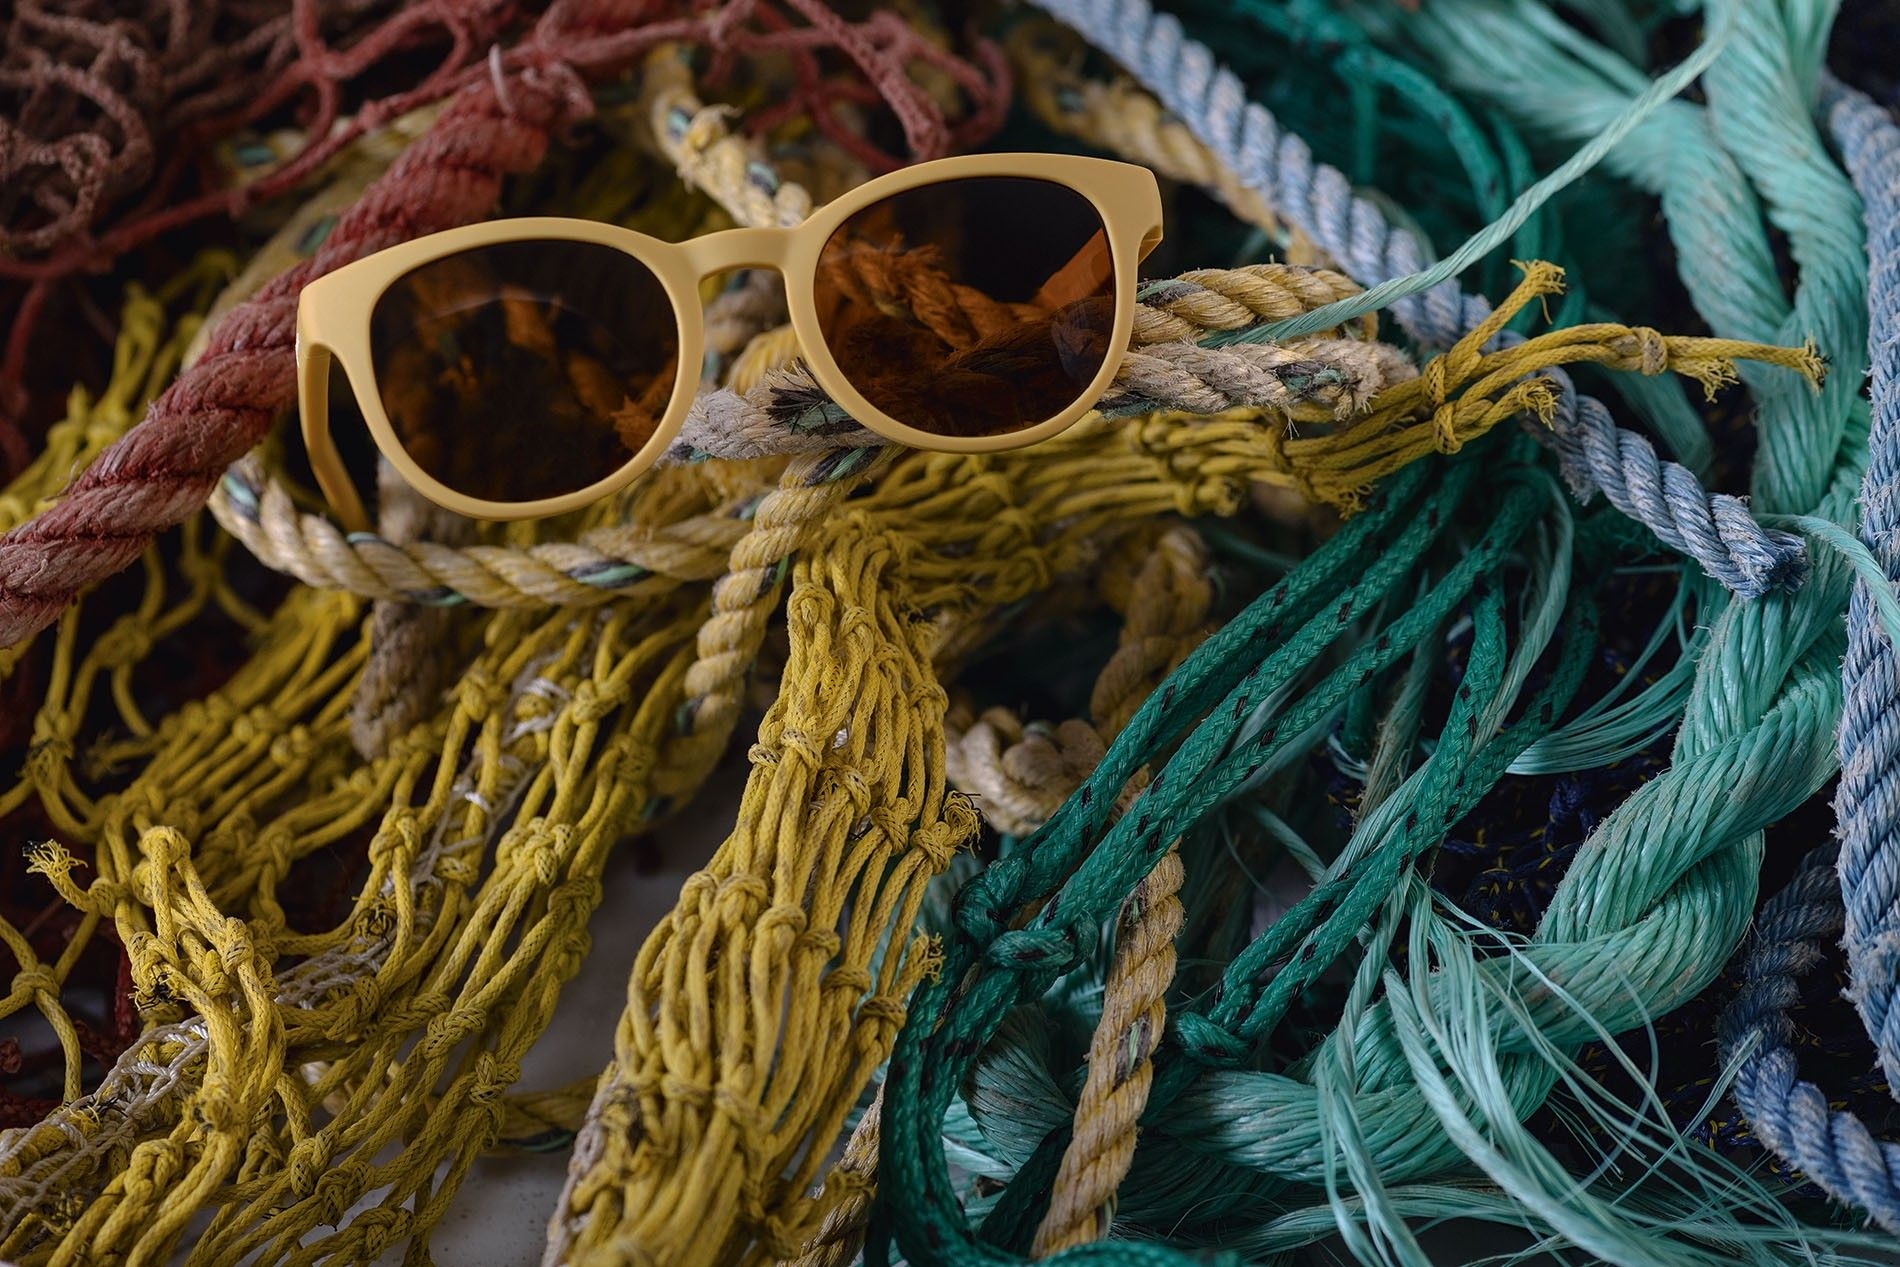 Karün sunglasses